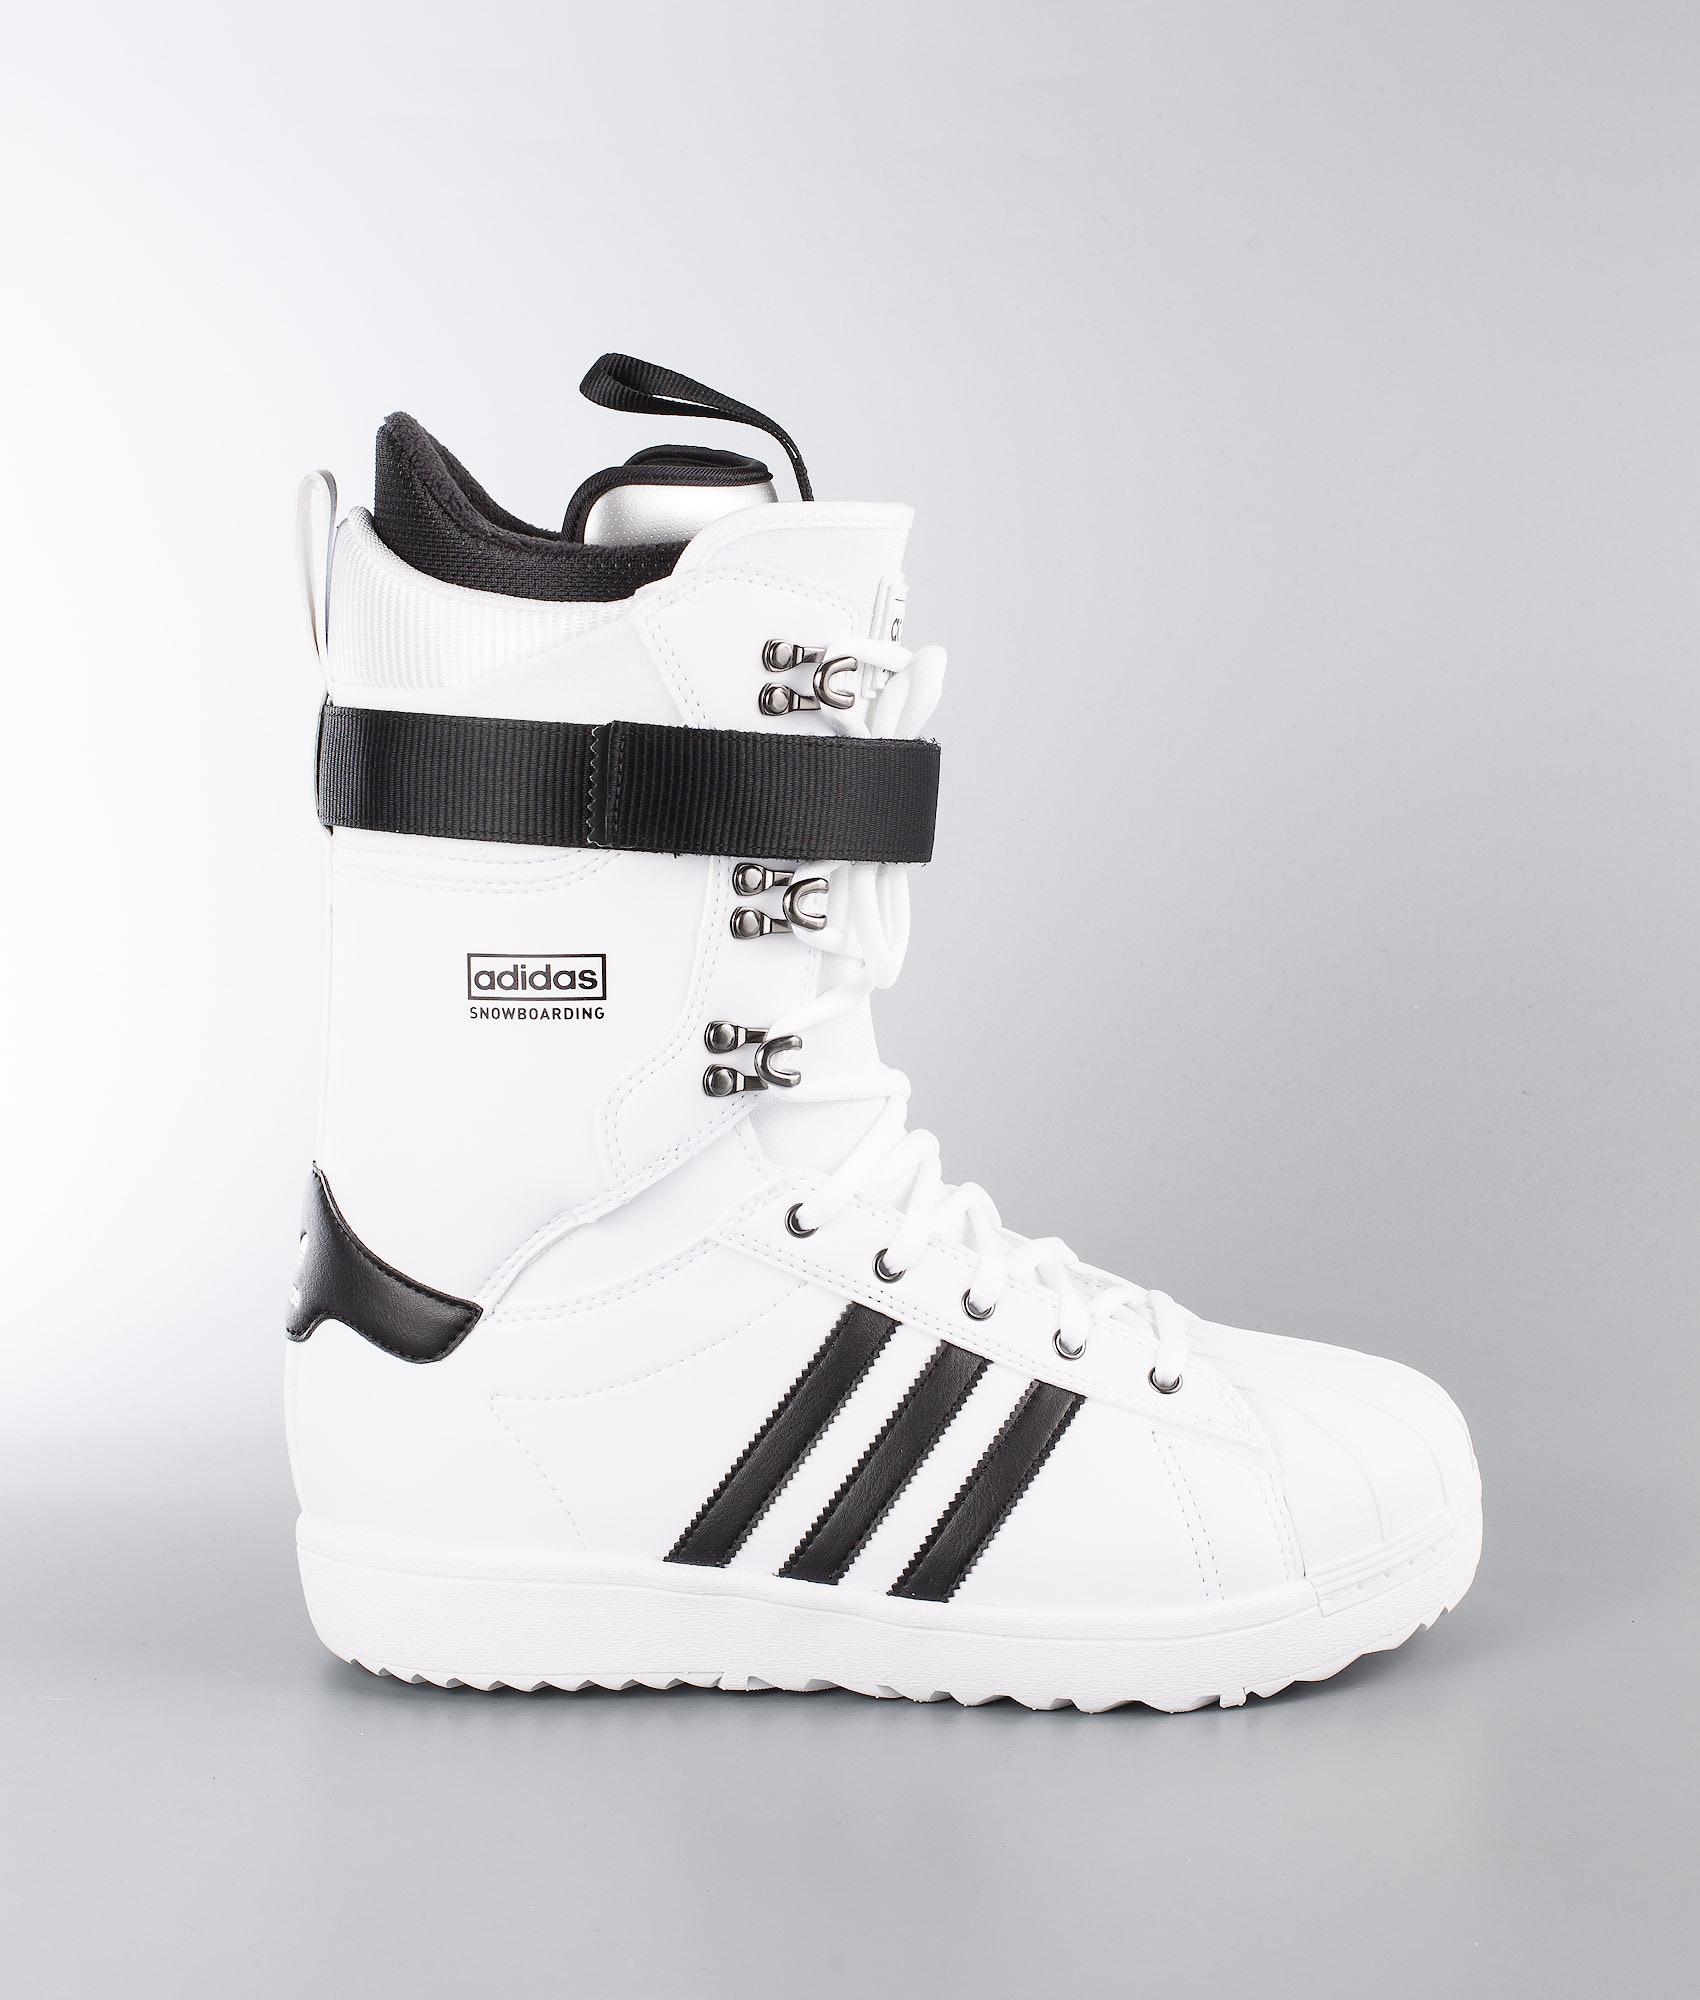 1cf8ddafc6 Adidas Snowboarding Superstar Adv Snowboard Boots Ftwr White Core ...